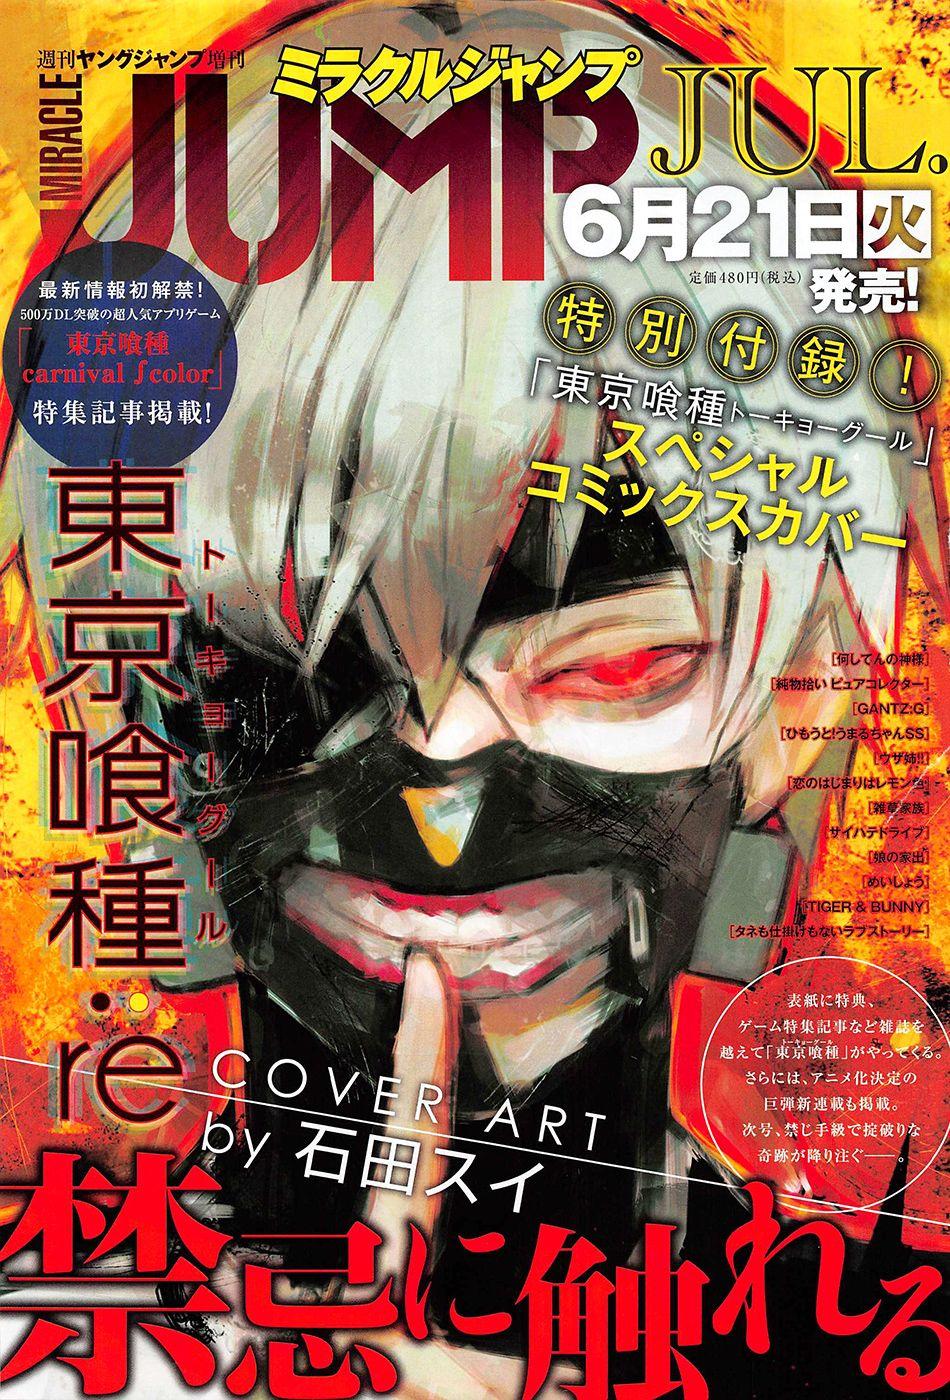 http://c5.ninemanga.com/es_manga/59/59/474649/ed1dac006b5ef6170e646d7eb9ee2d1a.jpg Page 2